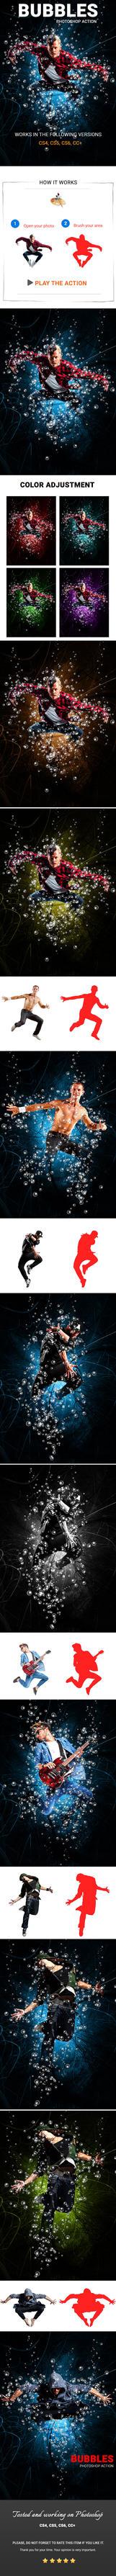 Bubbles Photoshop Action by Kluzya